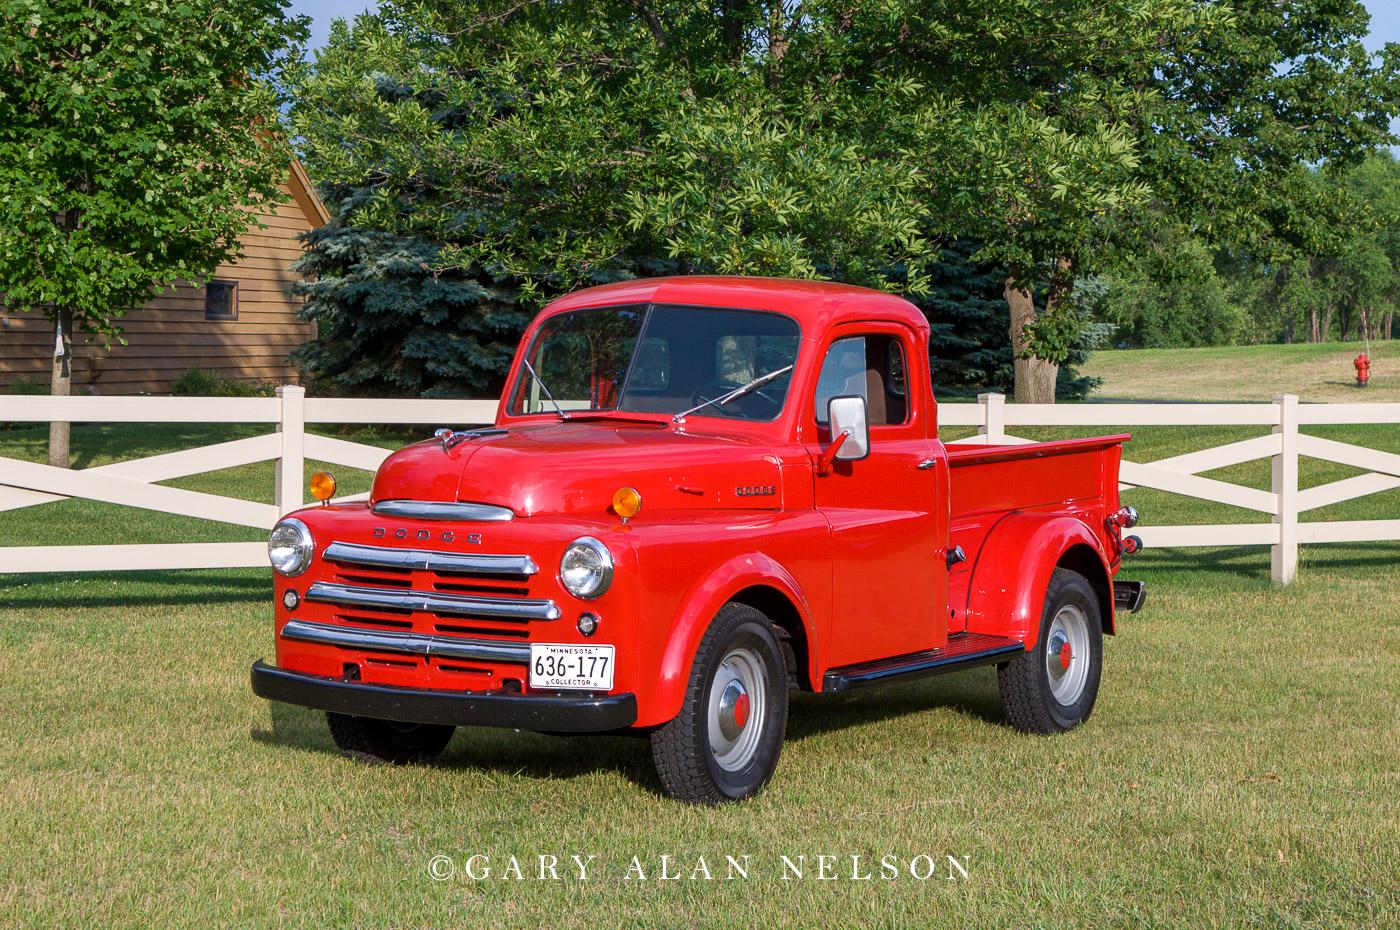 VT-07-72-DO 1949 Dodge B1B 1/2 ton pickup